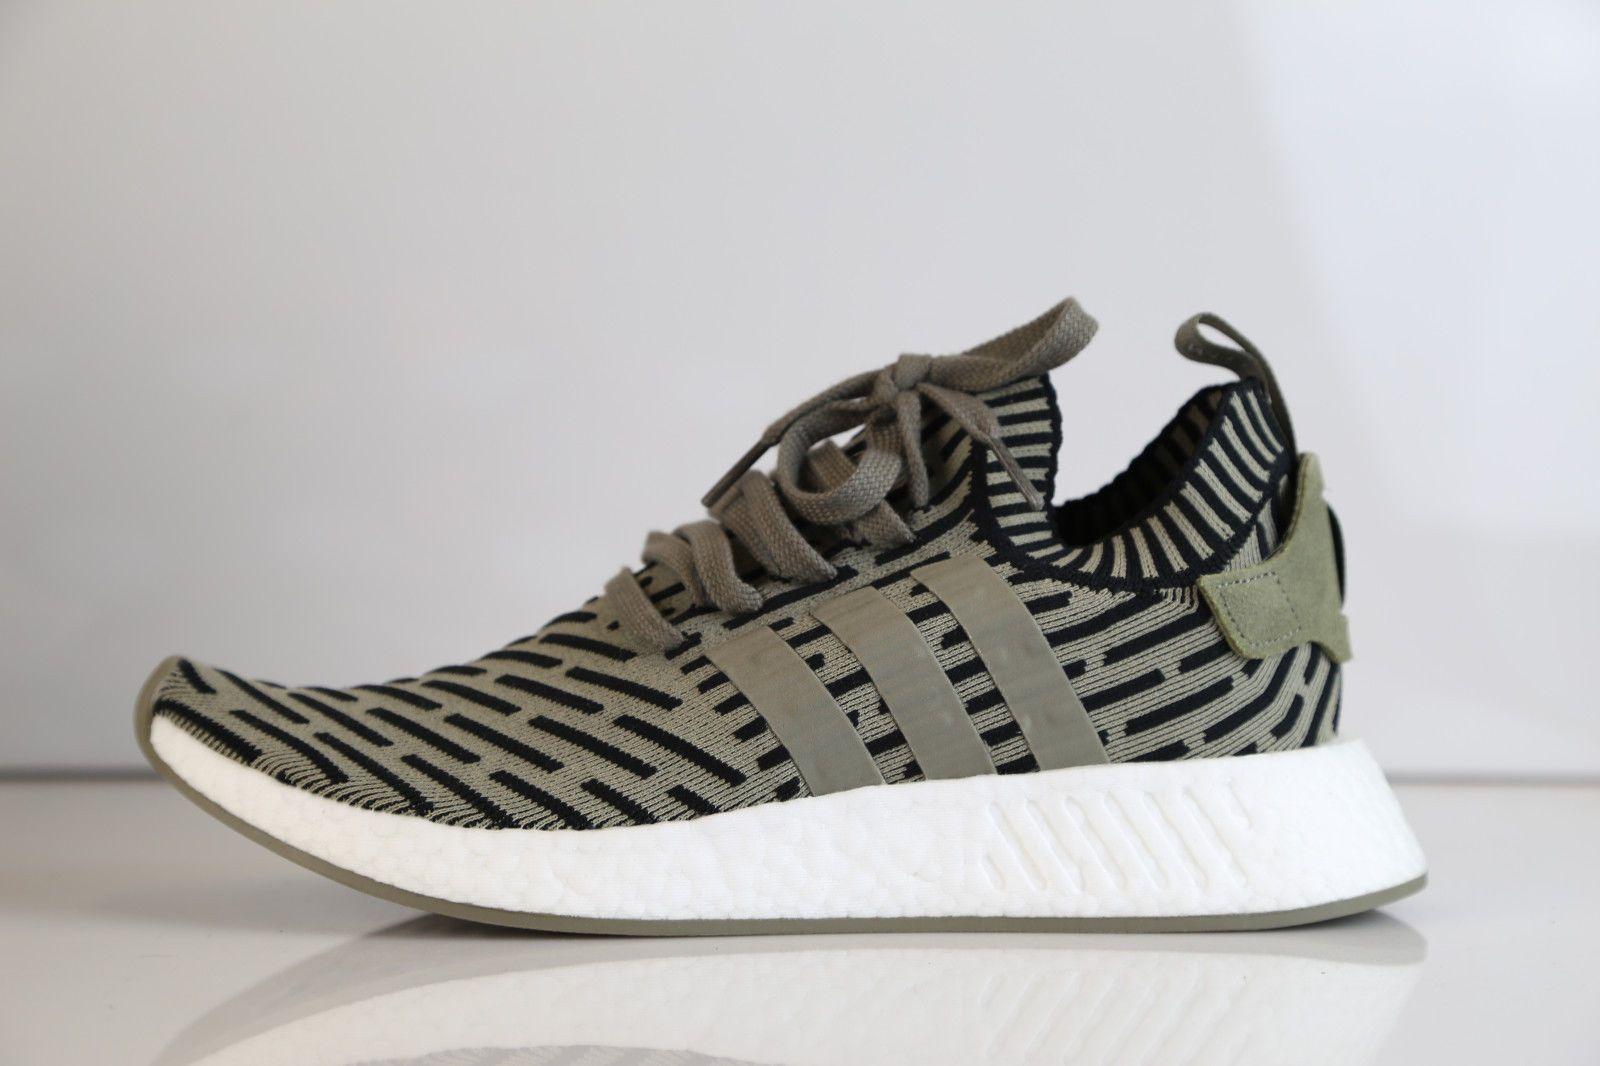 Adidas NMD R2 PK Trace carga negro Olive hombre  corriendo zapatos blog